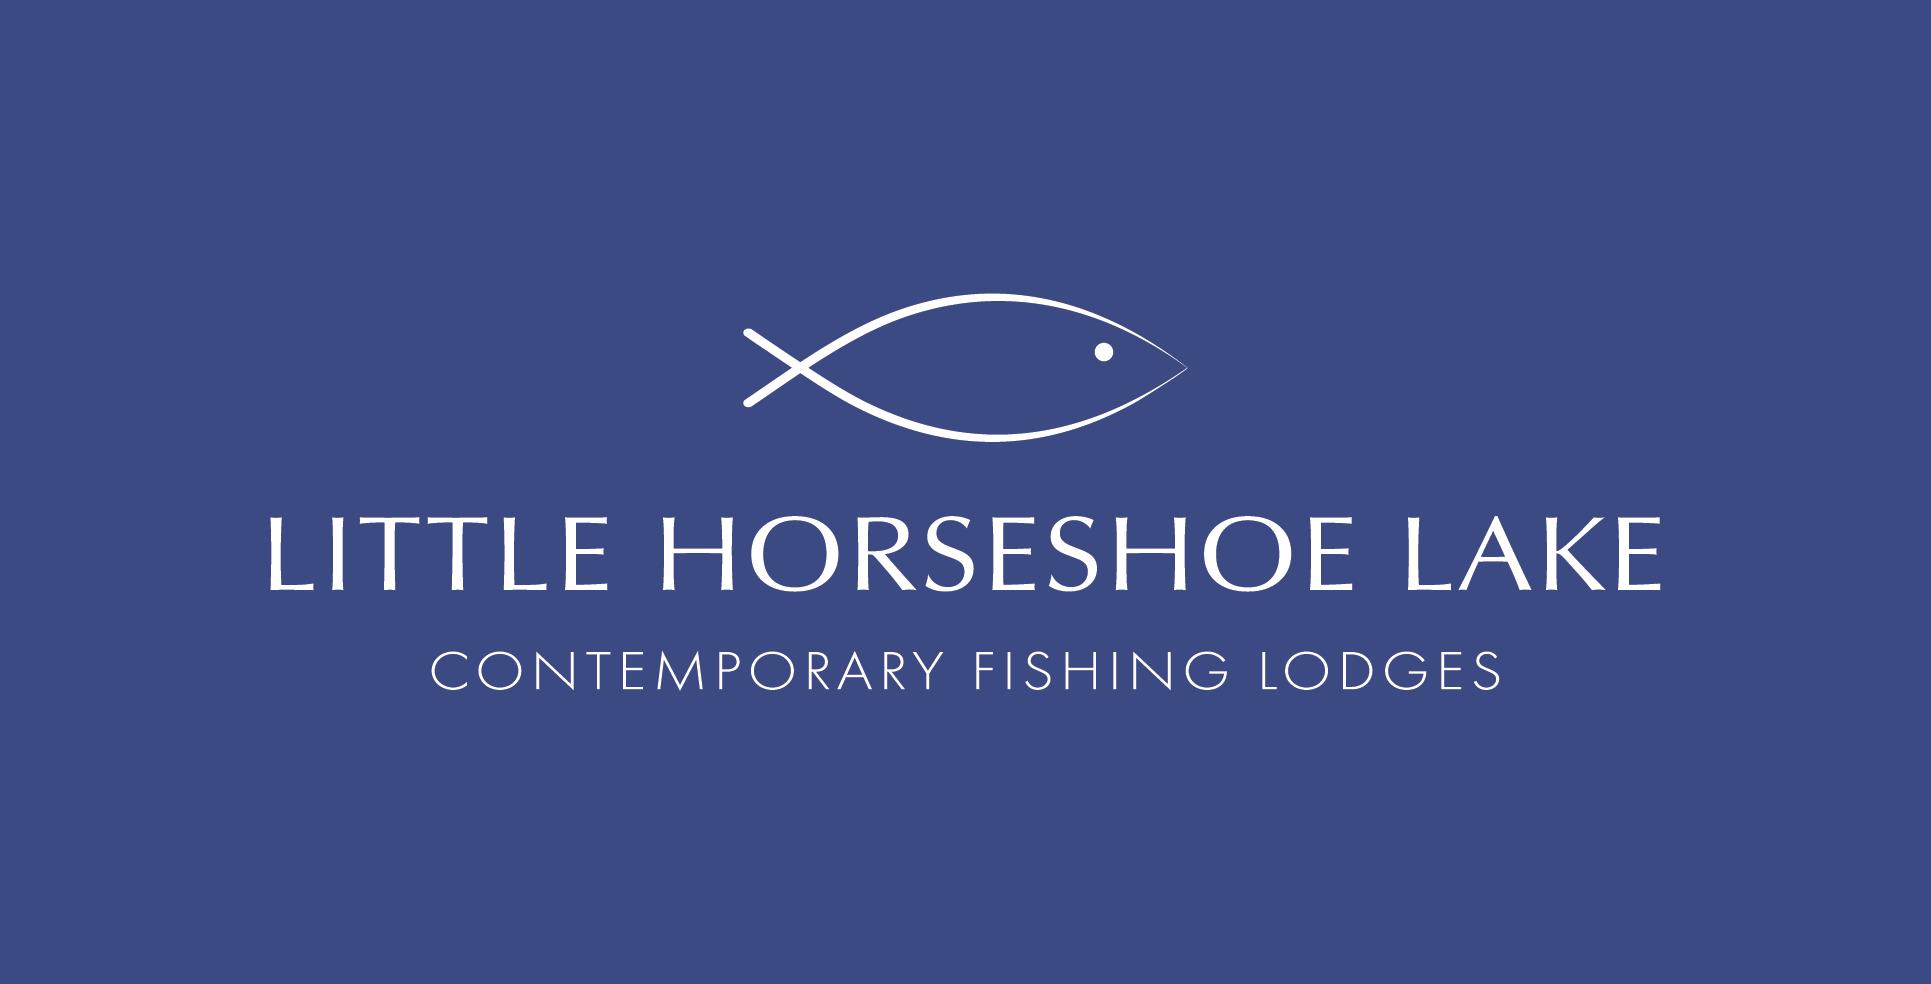 Little Horseshoe Lake Fishing Lodges